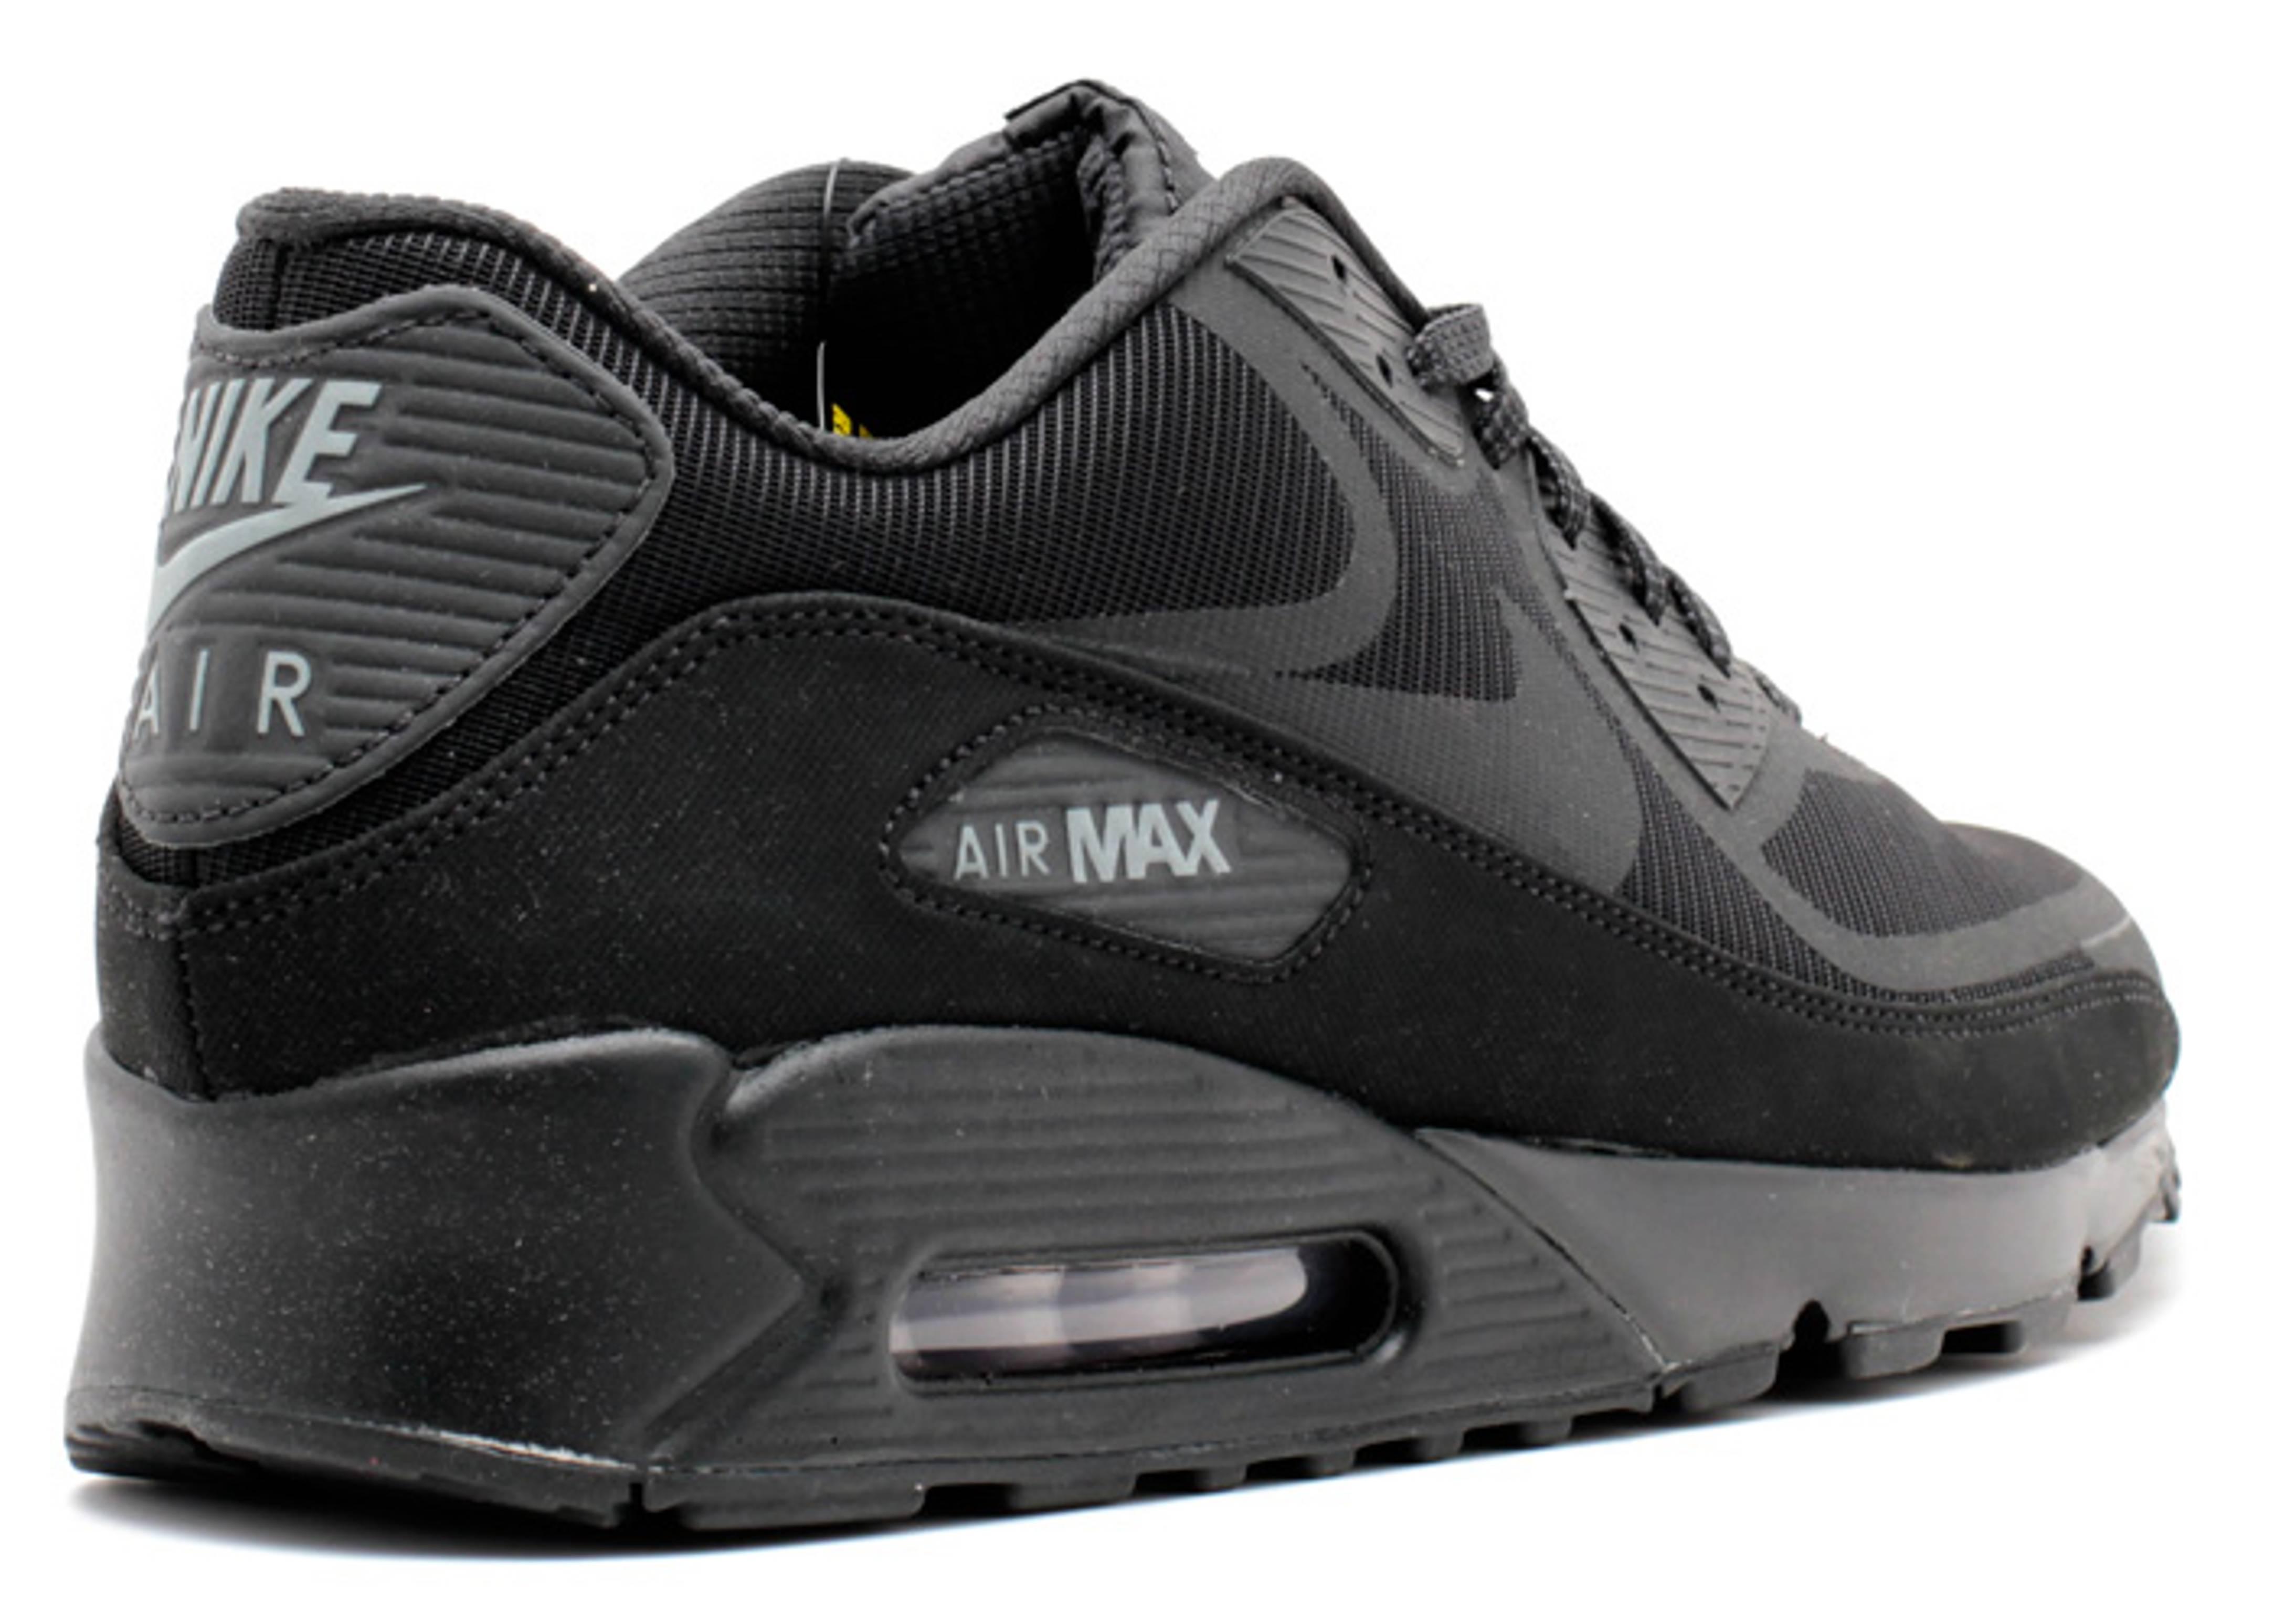 finest selection d15e5 89e21 Nike Air Max 90 Essential Australia Womens Air Jordan 13 Retro Shoes Black  Pink